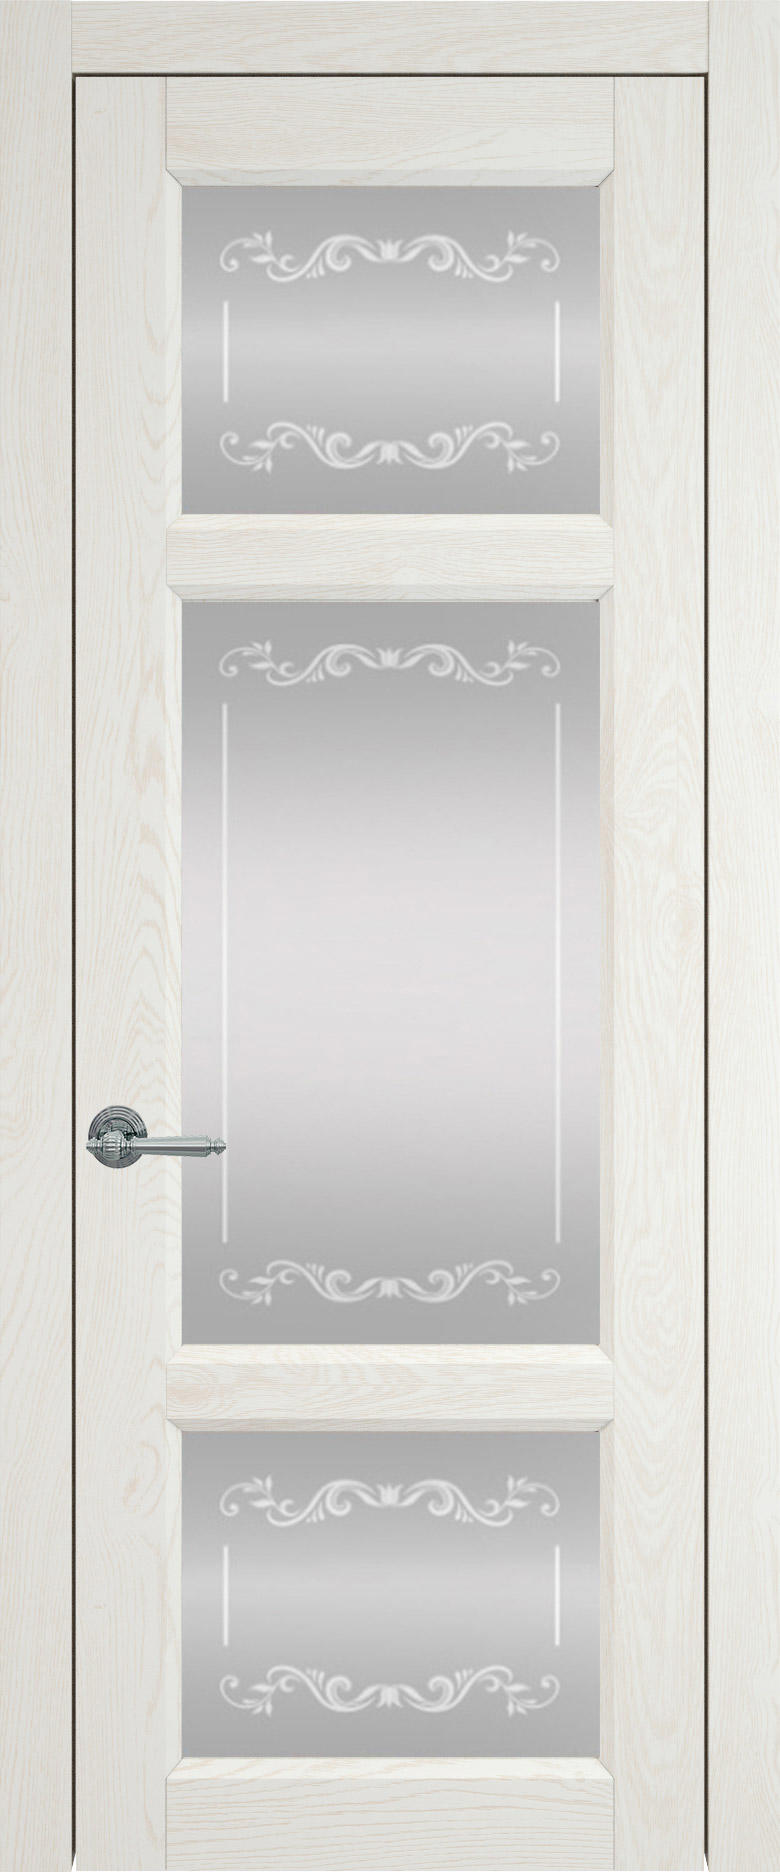 Siena цвет - Белый ясень (шпон) Со стеклом (ДО)